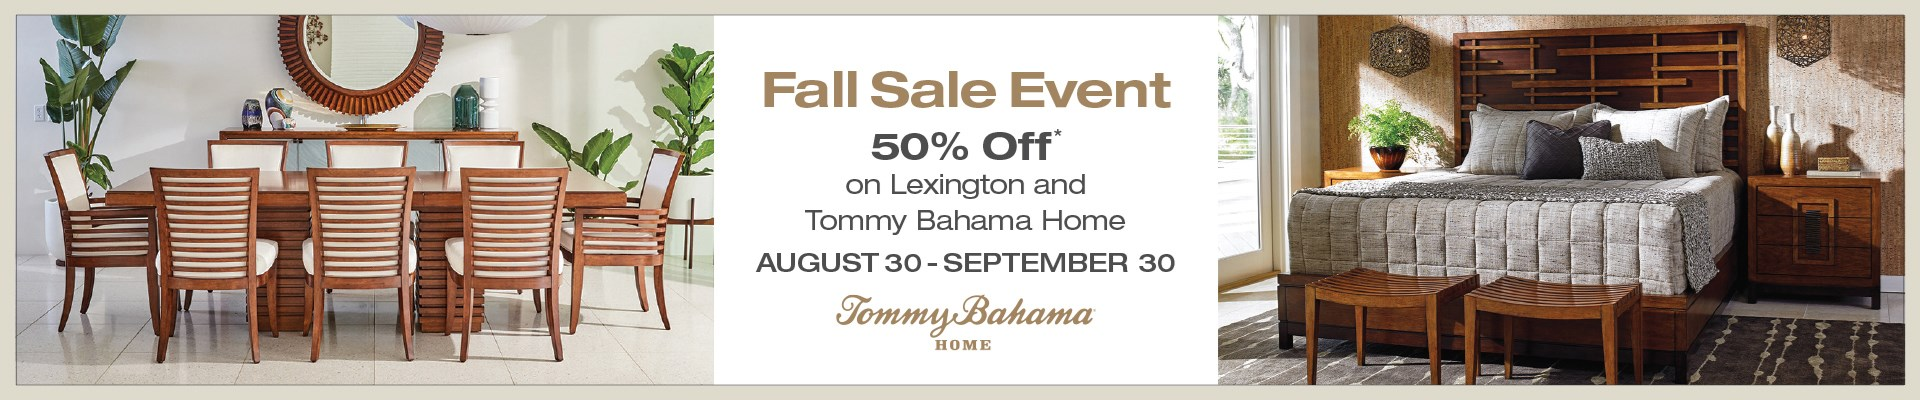 Lexington Fall Event Sale